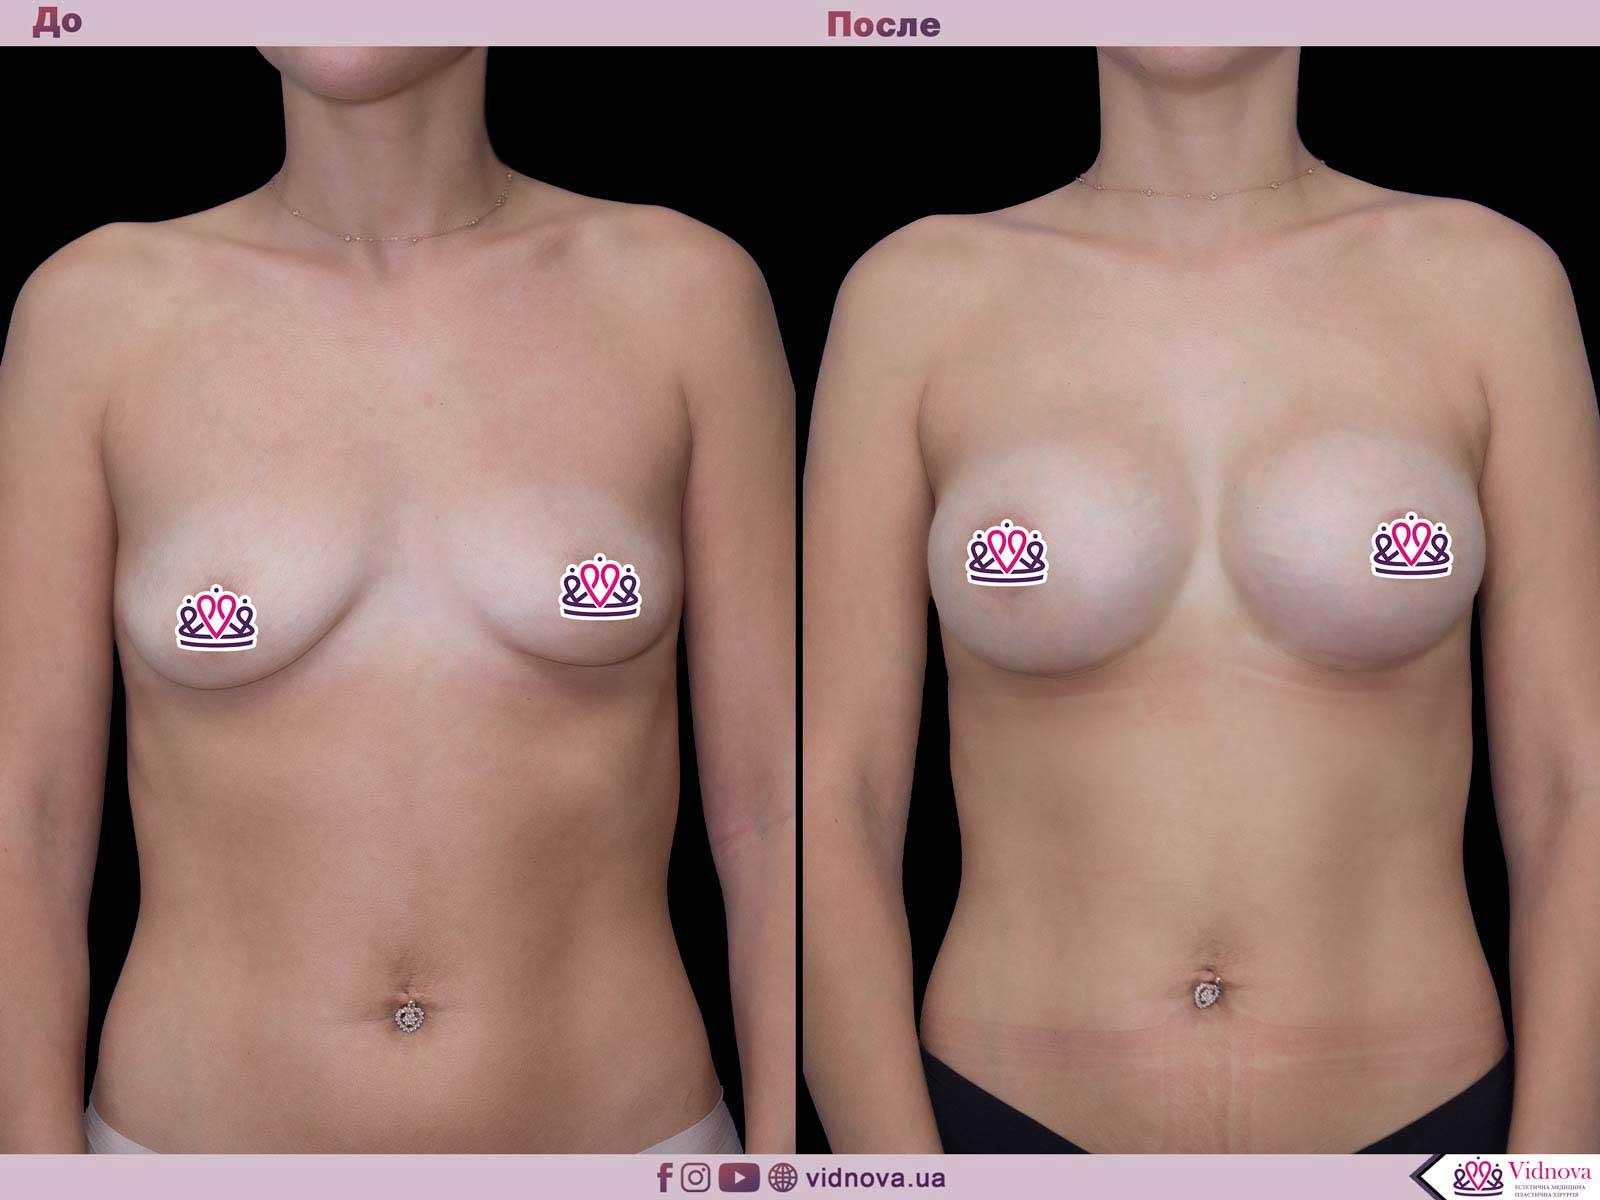 Увеличение груди: Фото ДО и ПОСЛЕ - Пример №49-1 - Клиника Vidnova